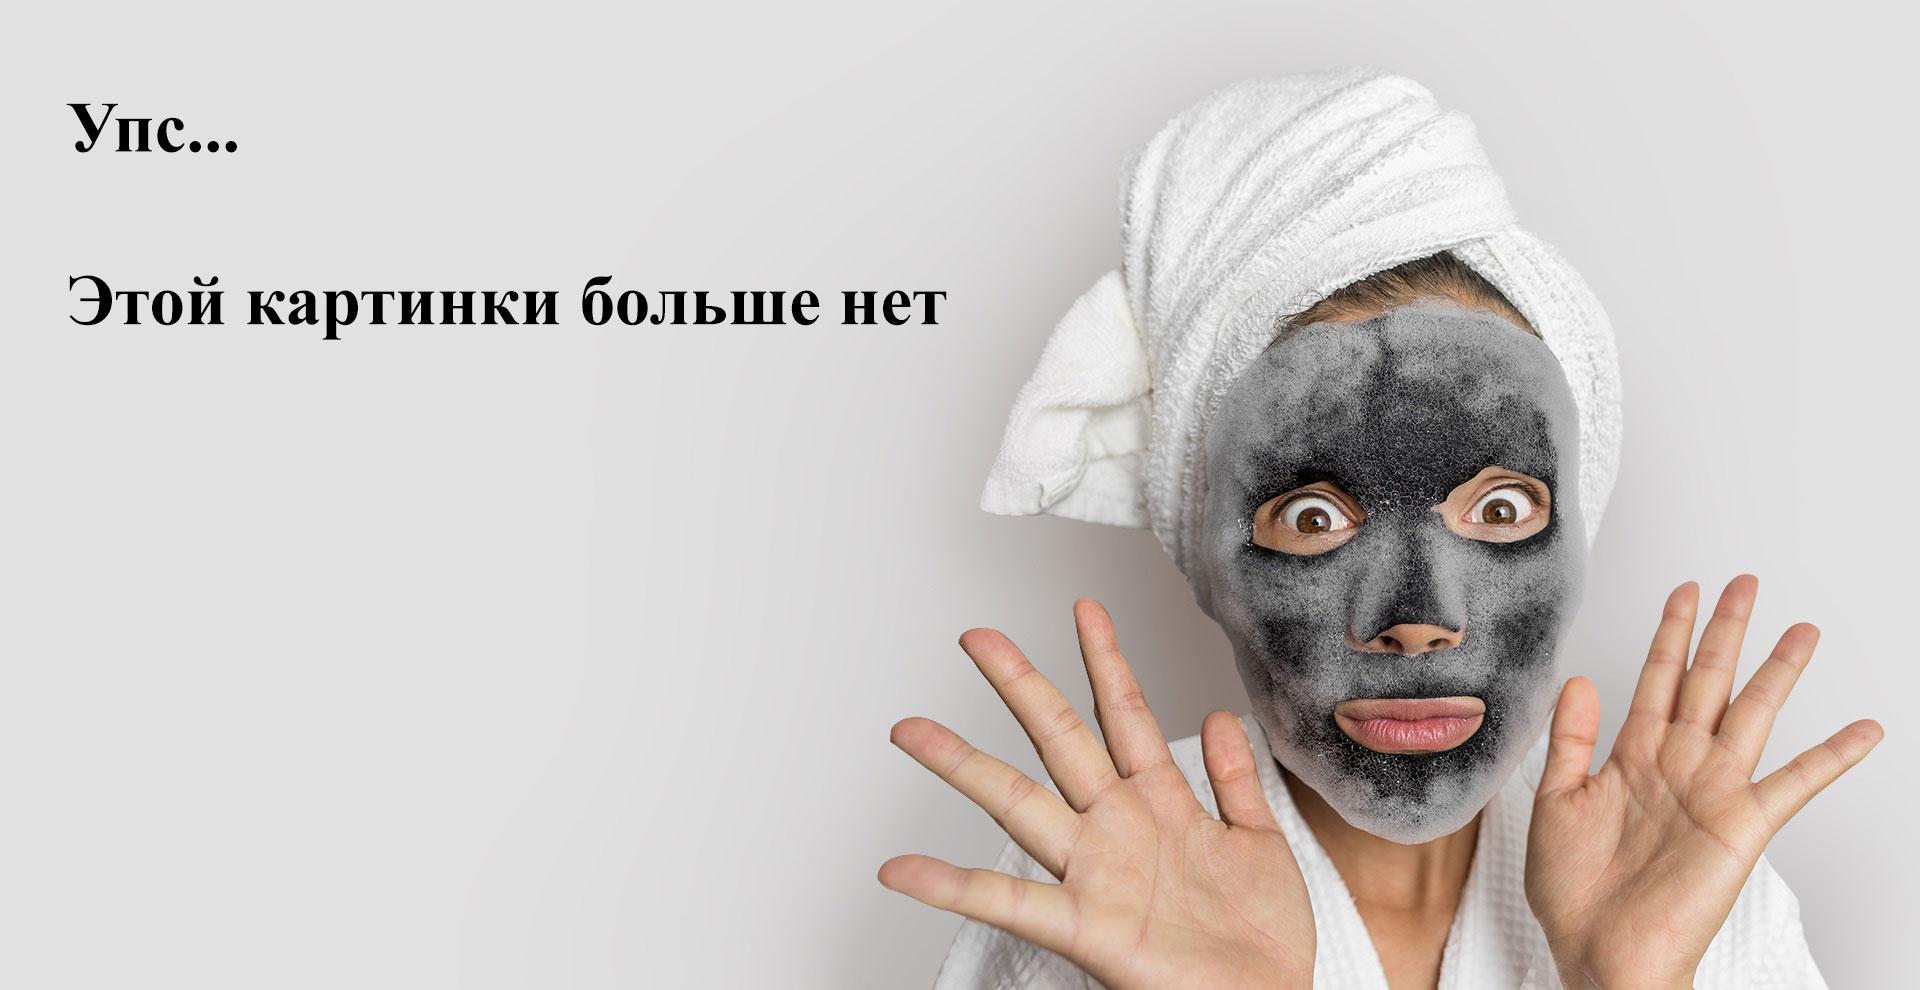 Funny Organix, Пенка для умывания Healing Herbs, 20 мл